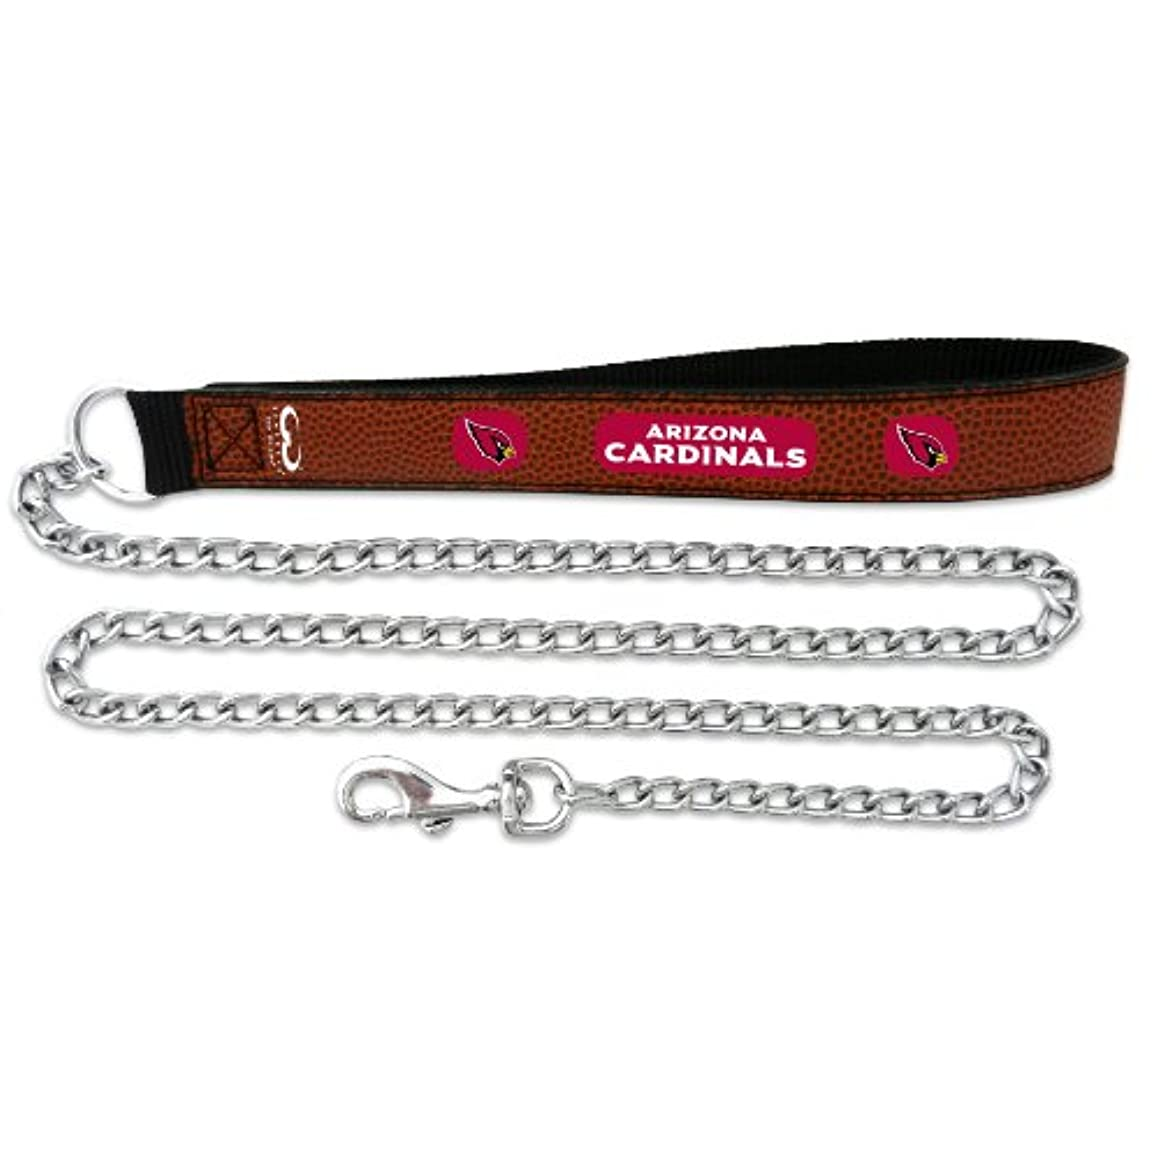 Arizona Cardinals Football Leather 2.5mm Chain Leash - M